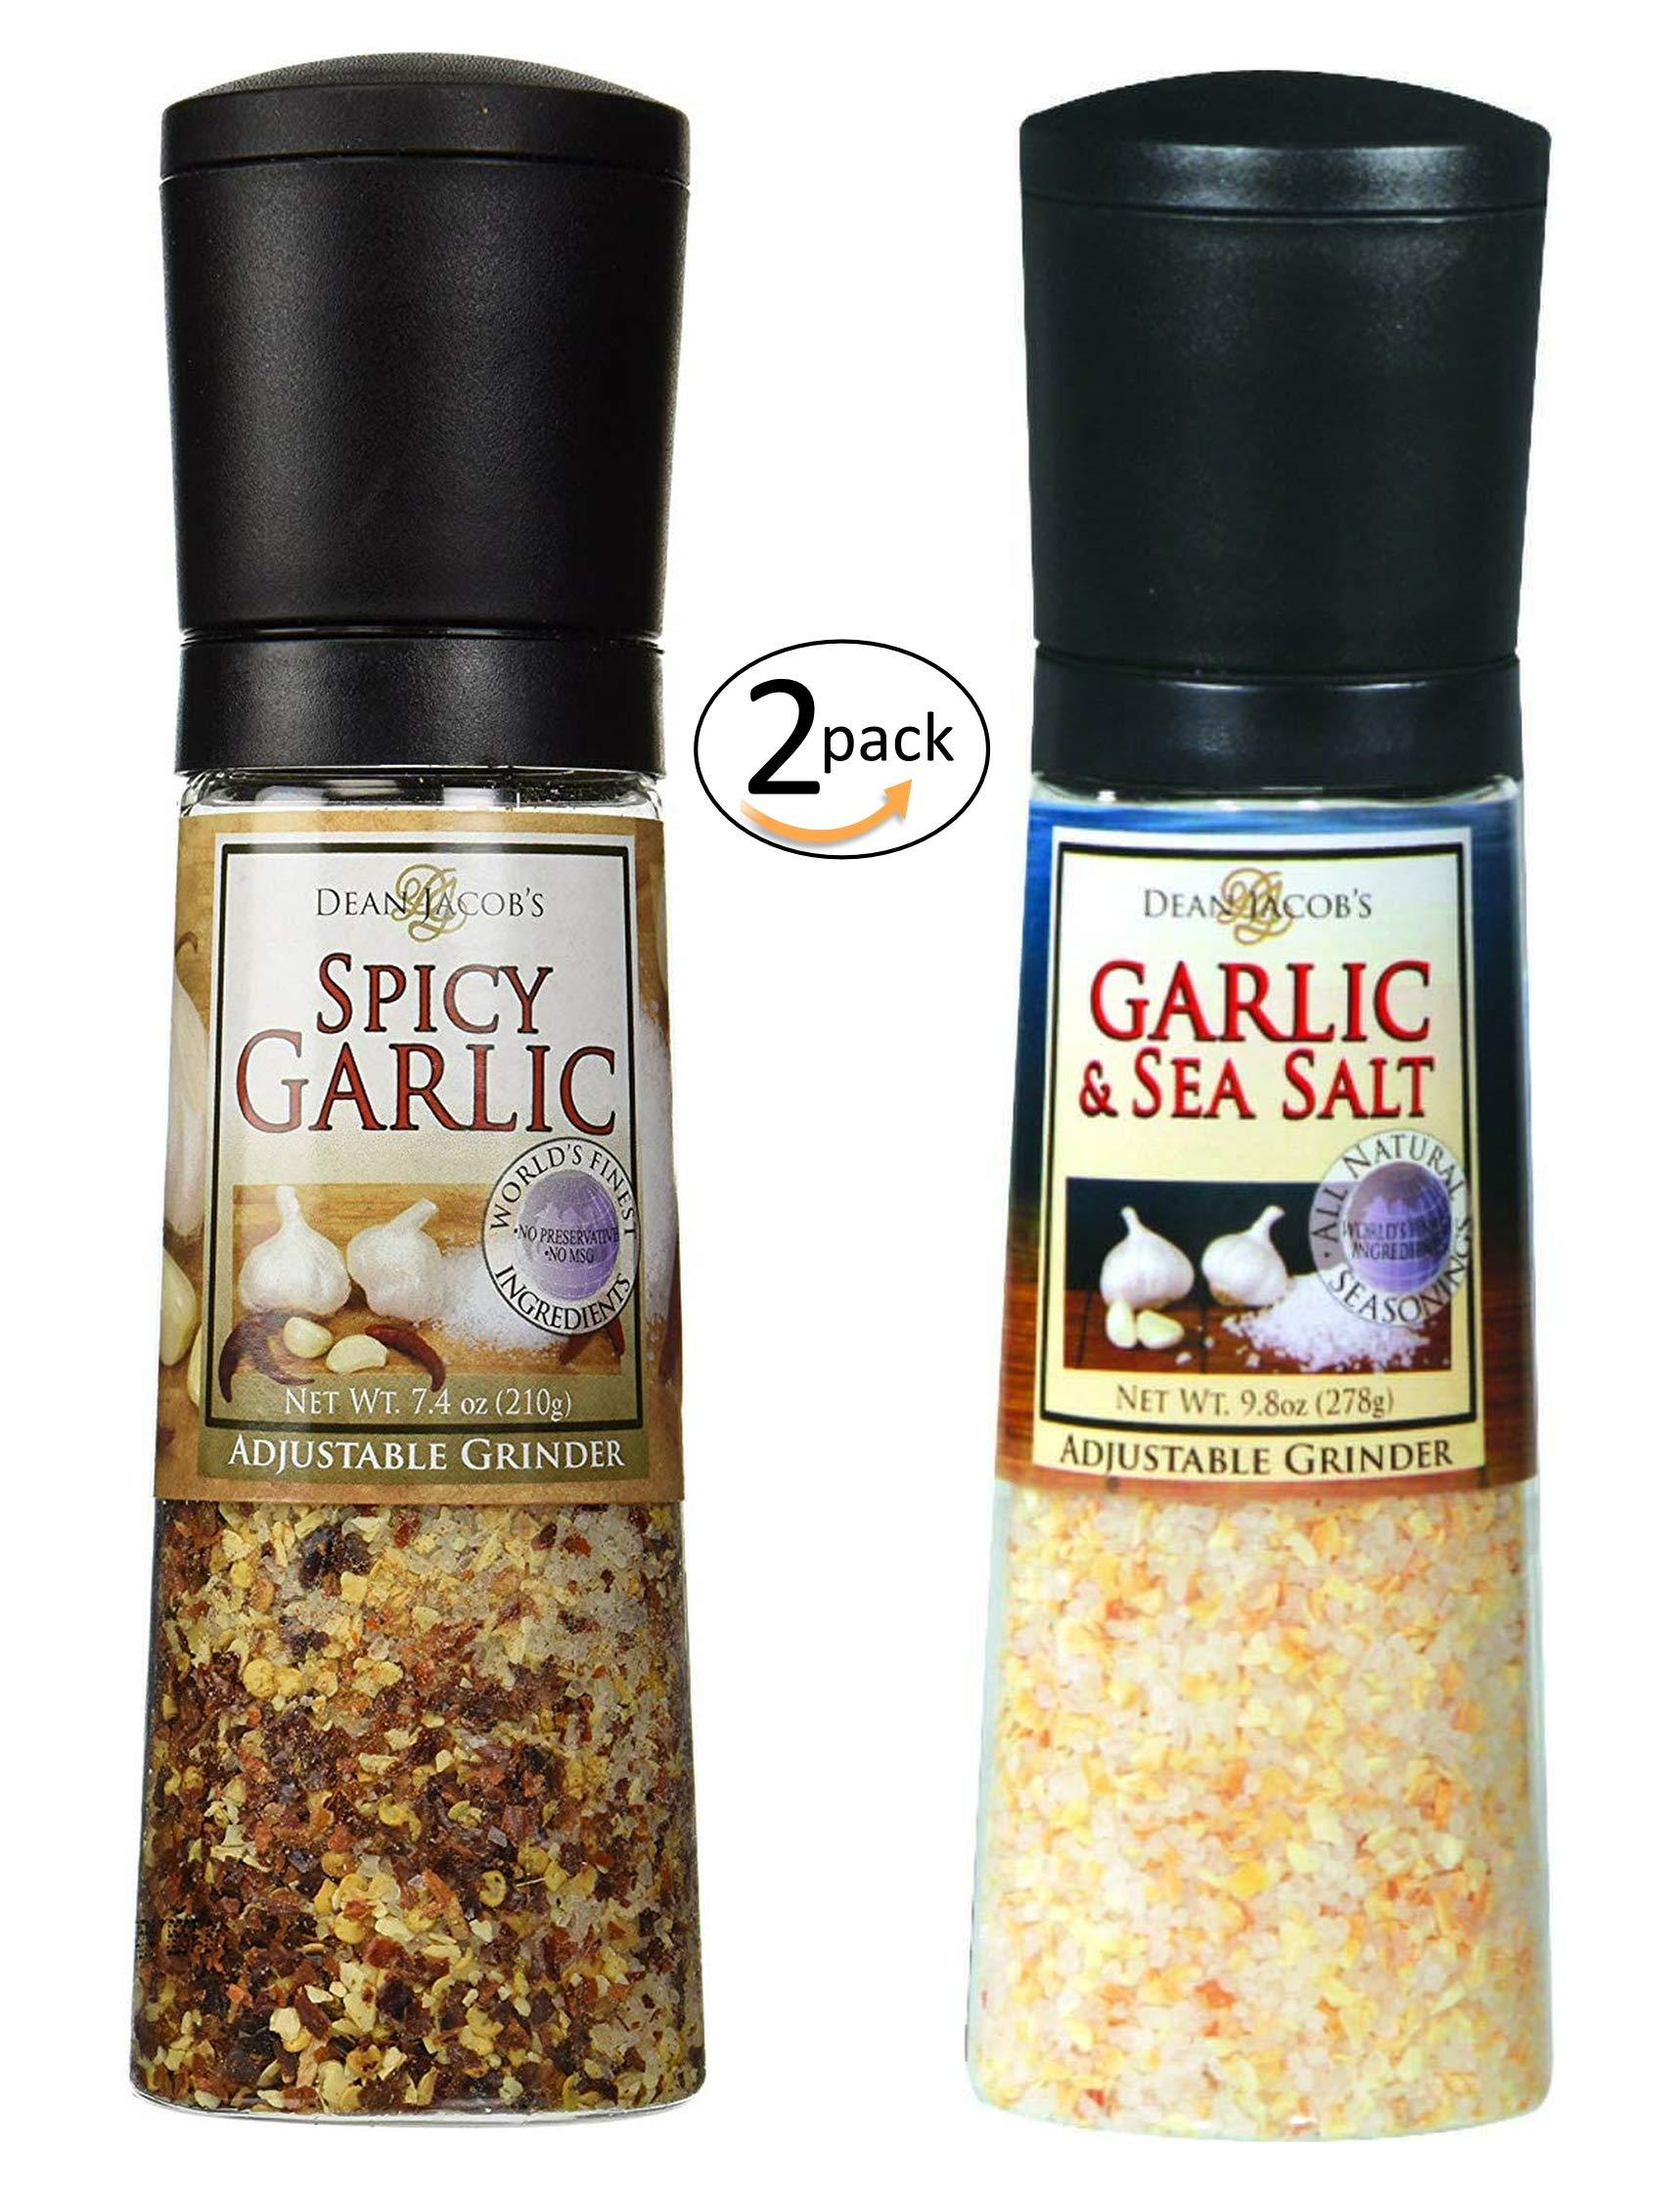 Spicy Garlic Jumbo Adjustable Grinder, 7.4oz - and - Garlic & Sea Salt Jumbo Adjustable Grinder, 9.8oz - 2 pack